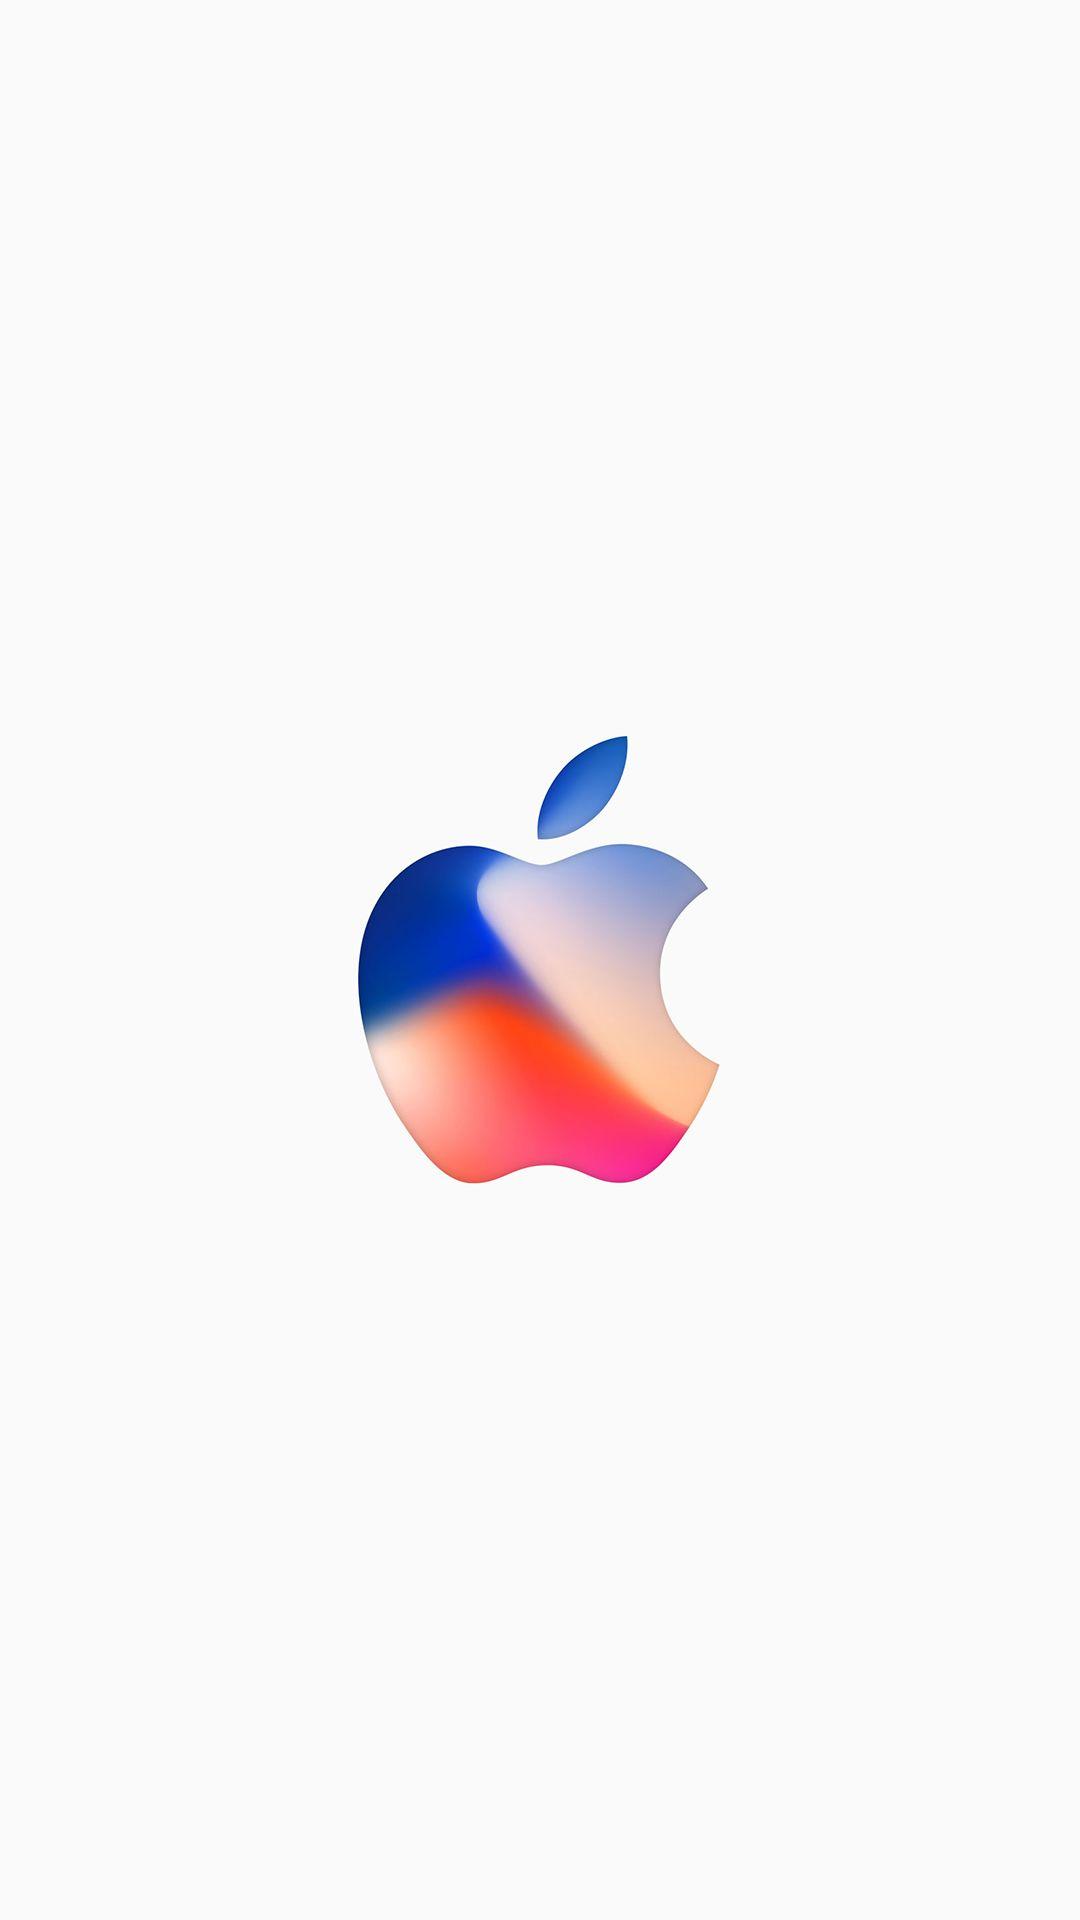 Stylish White Iphone8 Wallpaper Apple Wallpaper Iphone Apple Logo Wallpaper Iphone Iphone Wallpaper Logo